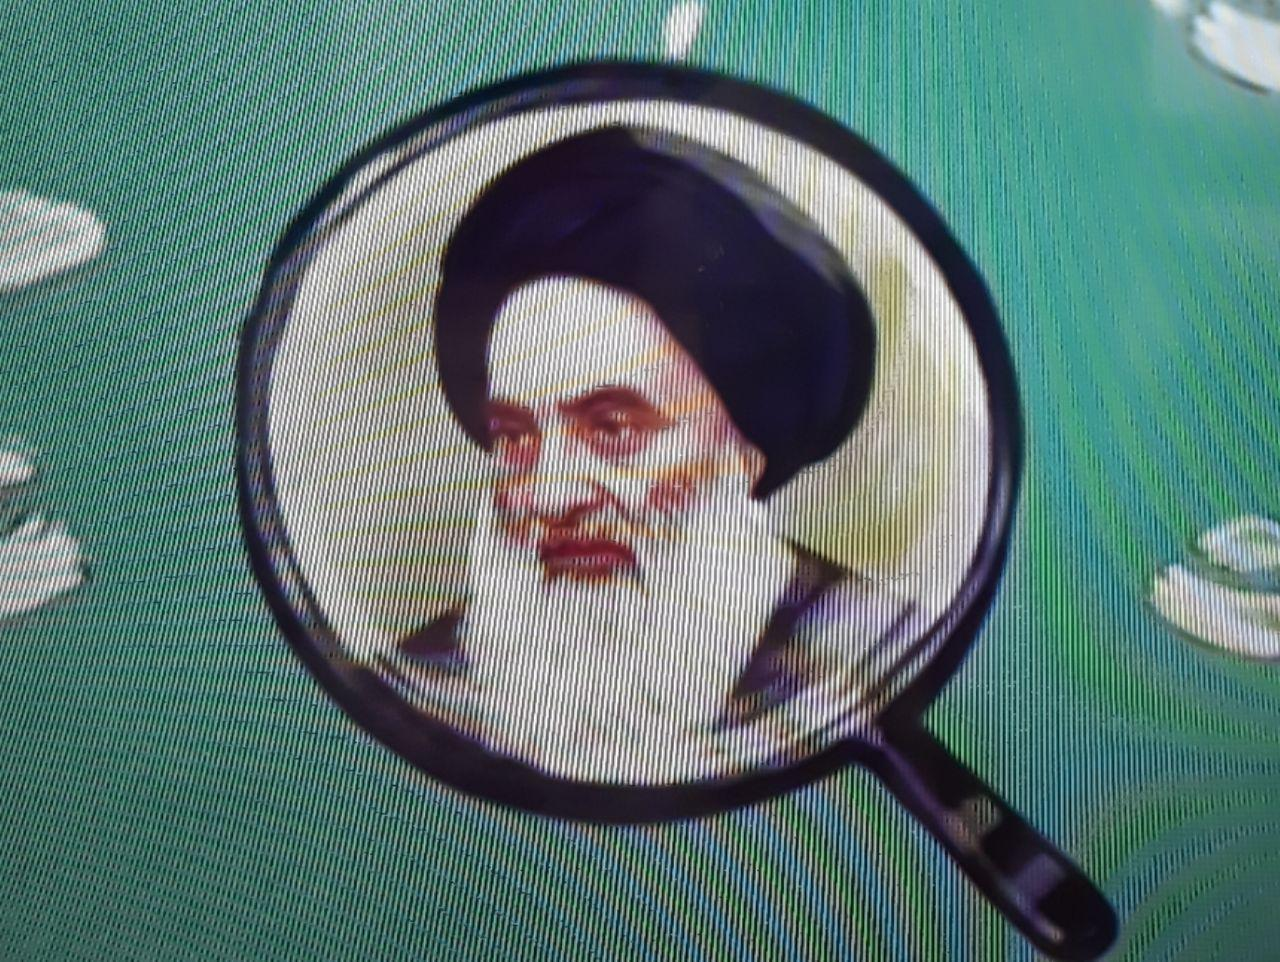 تبریک تولد آیتالله علی سیستانی در شبکه پویا (عکس)